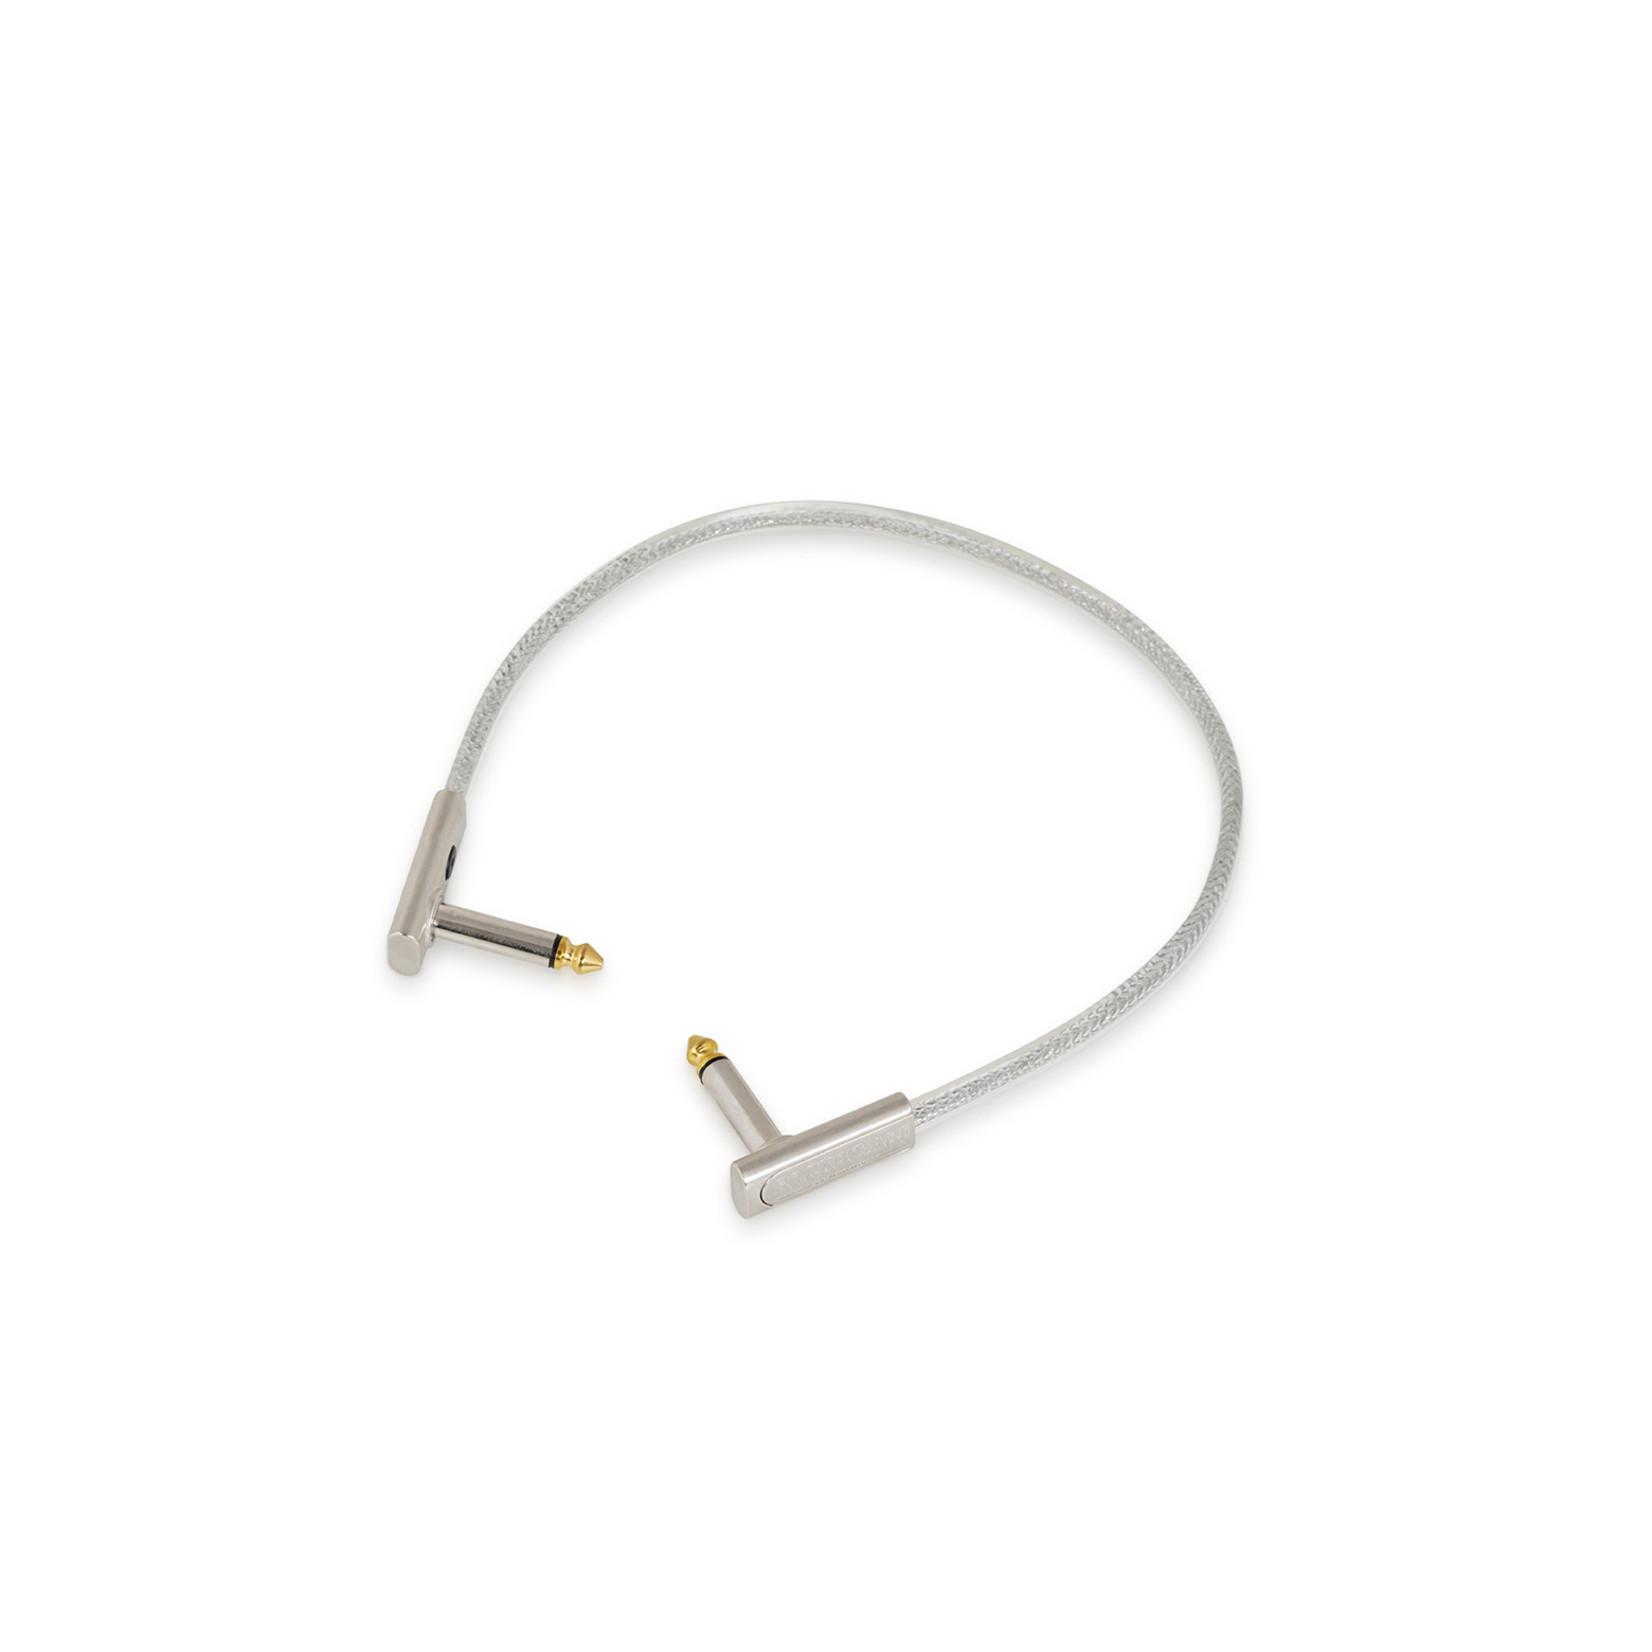 "Rockboard Rockboard Sapphire Series Flat Patch Cable, 30 cm / 11 13/16"" (RBO CAB PC F 30 SP)"